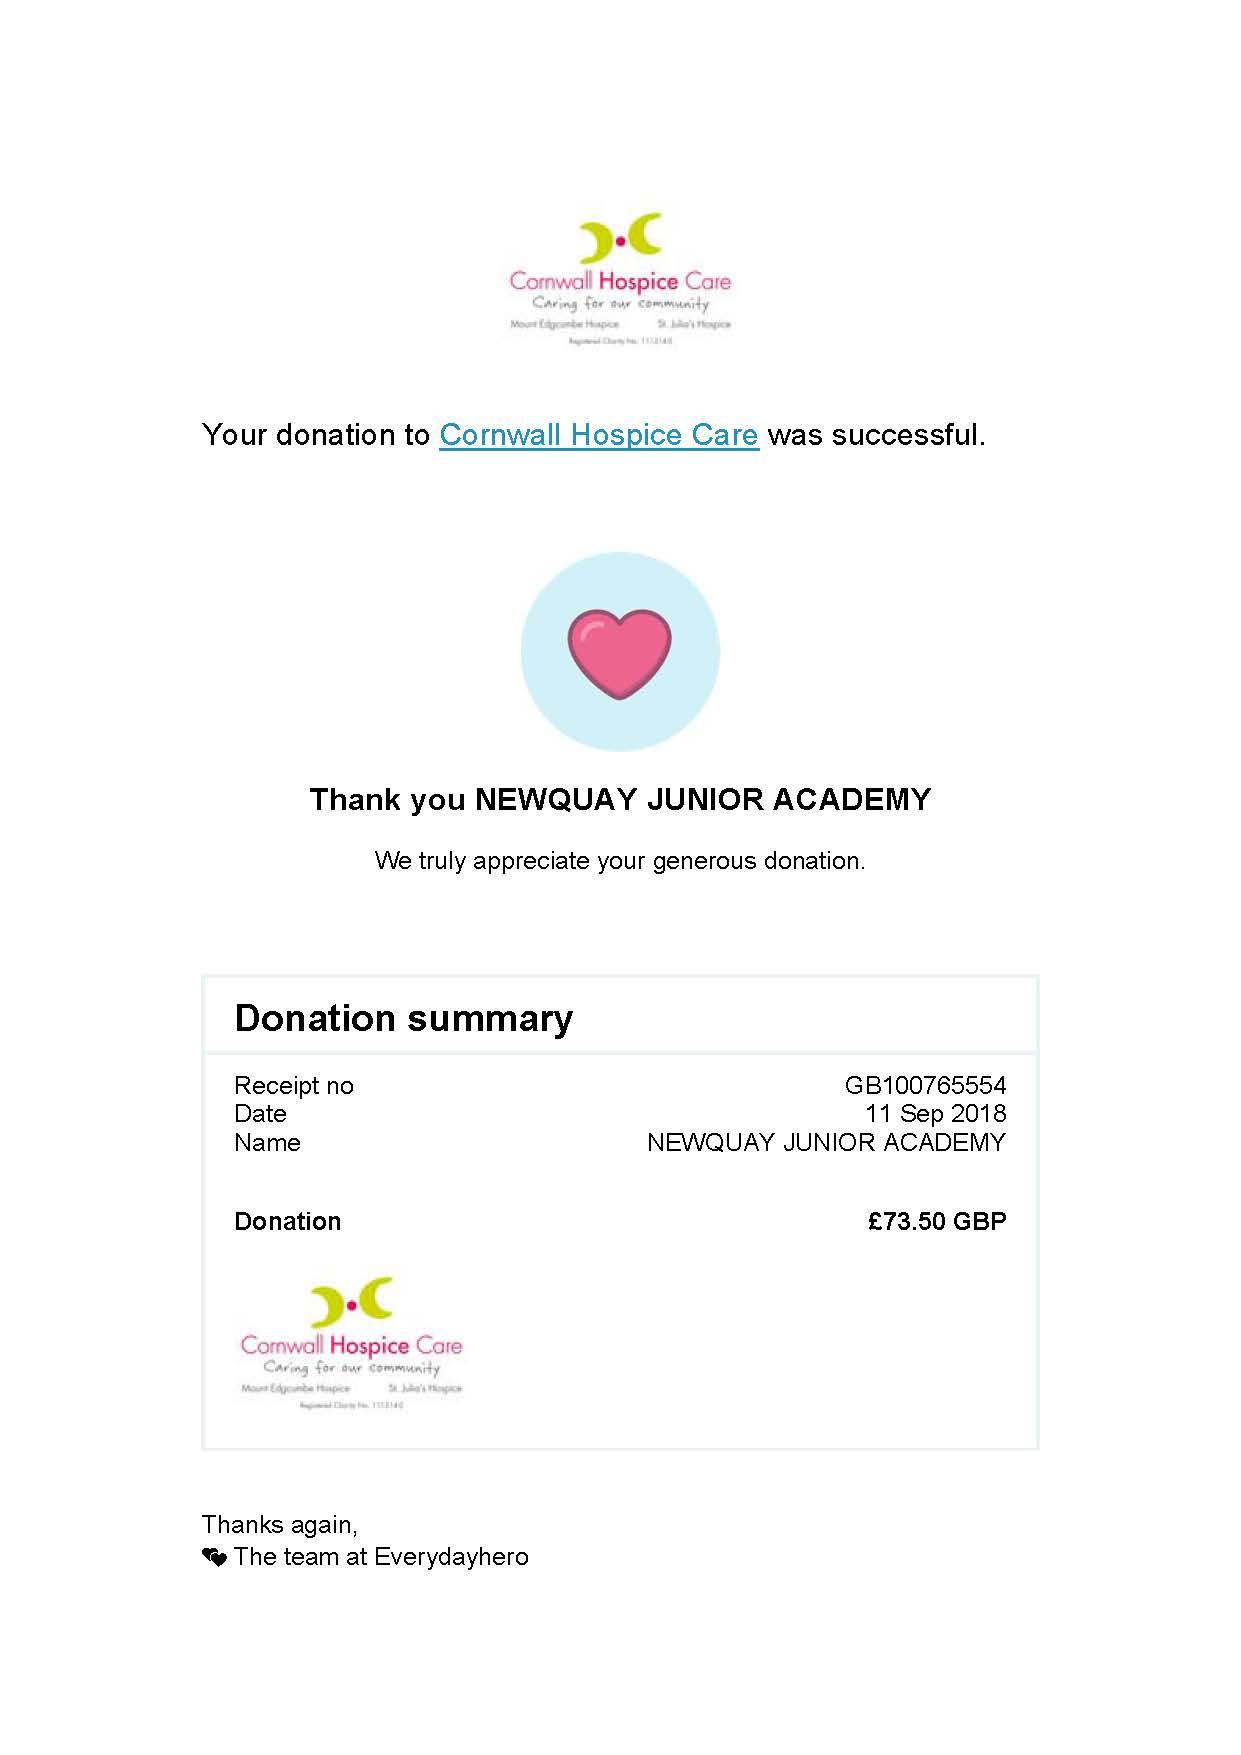 NJA World Cup Donation – Newquay Junior Academy